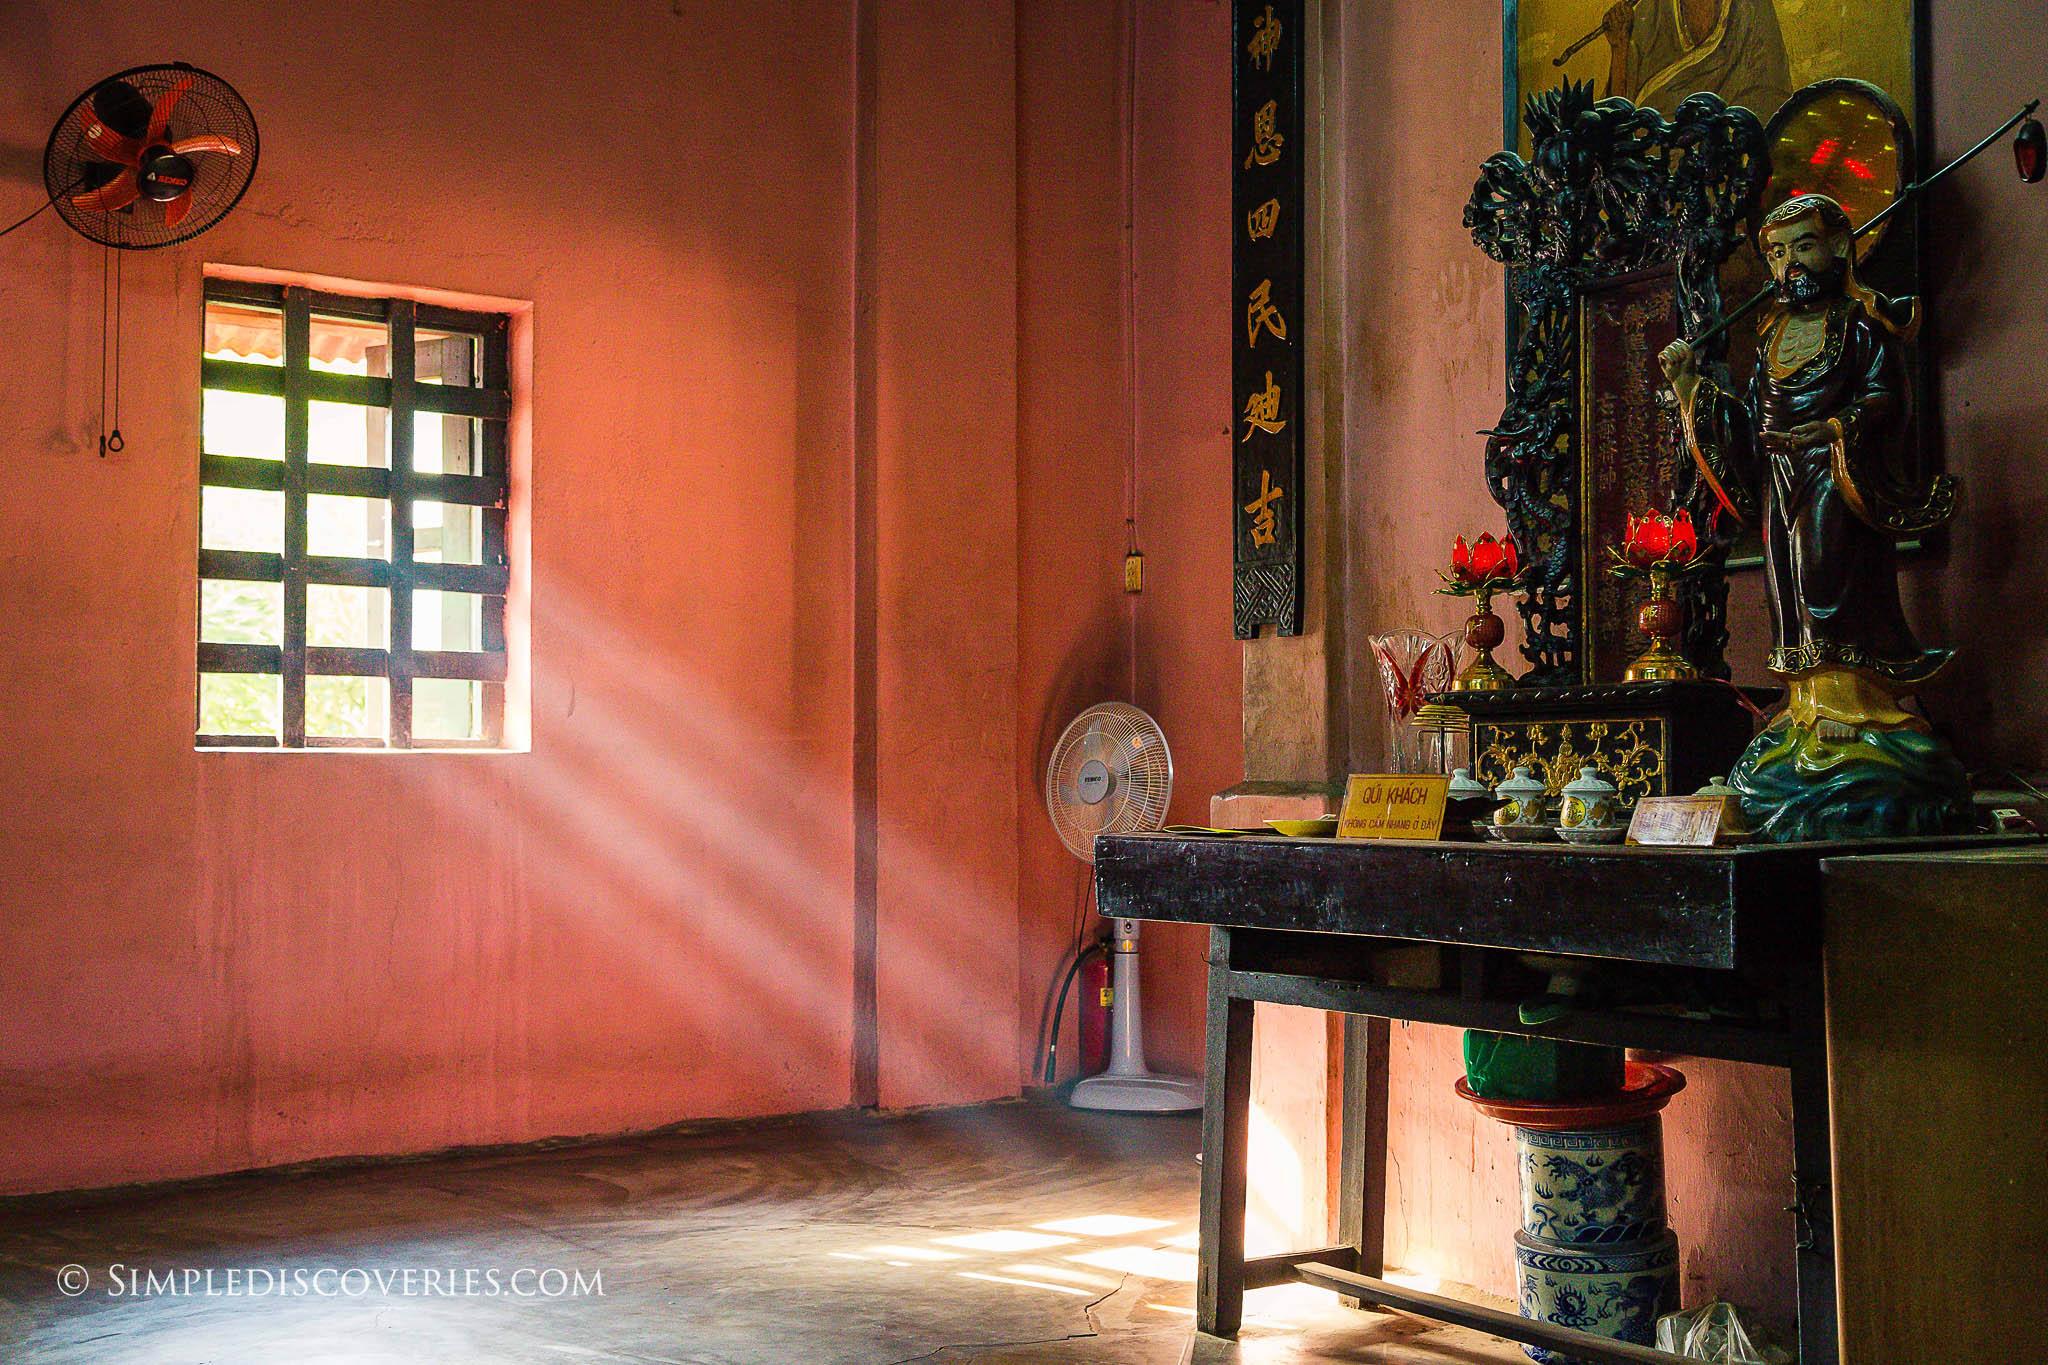 vietnam_jade_emperor_pagoda